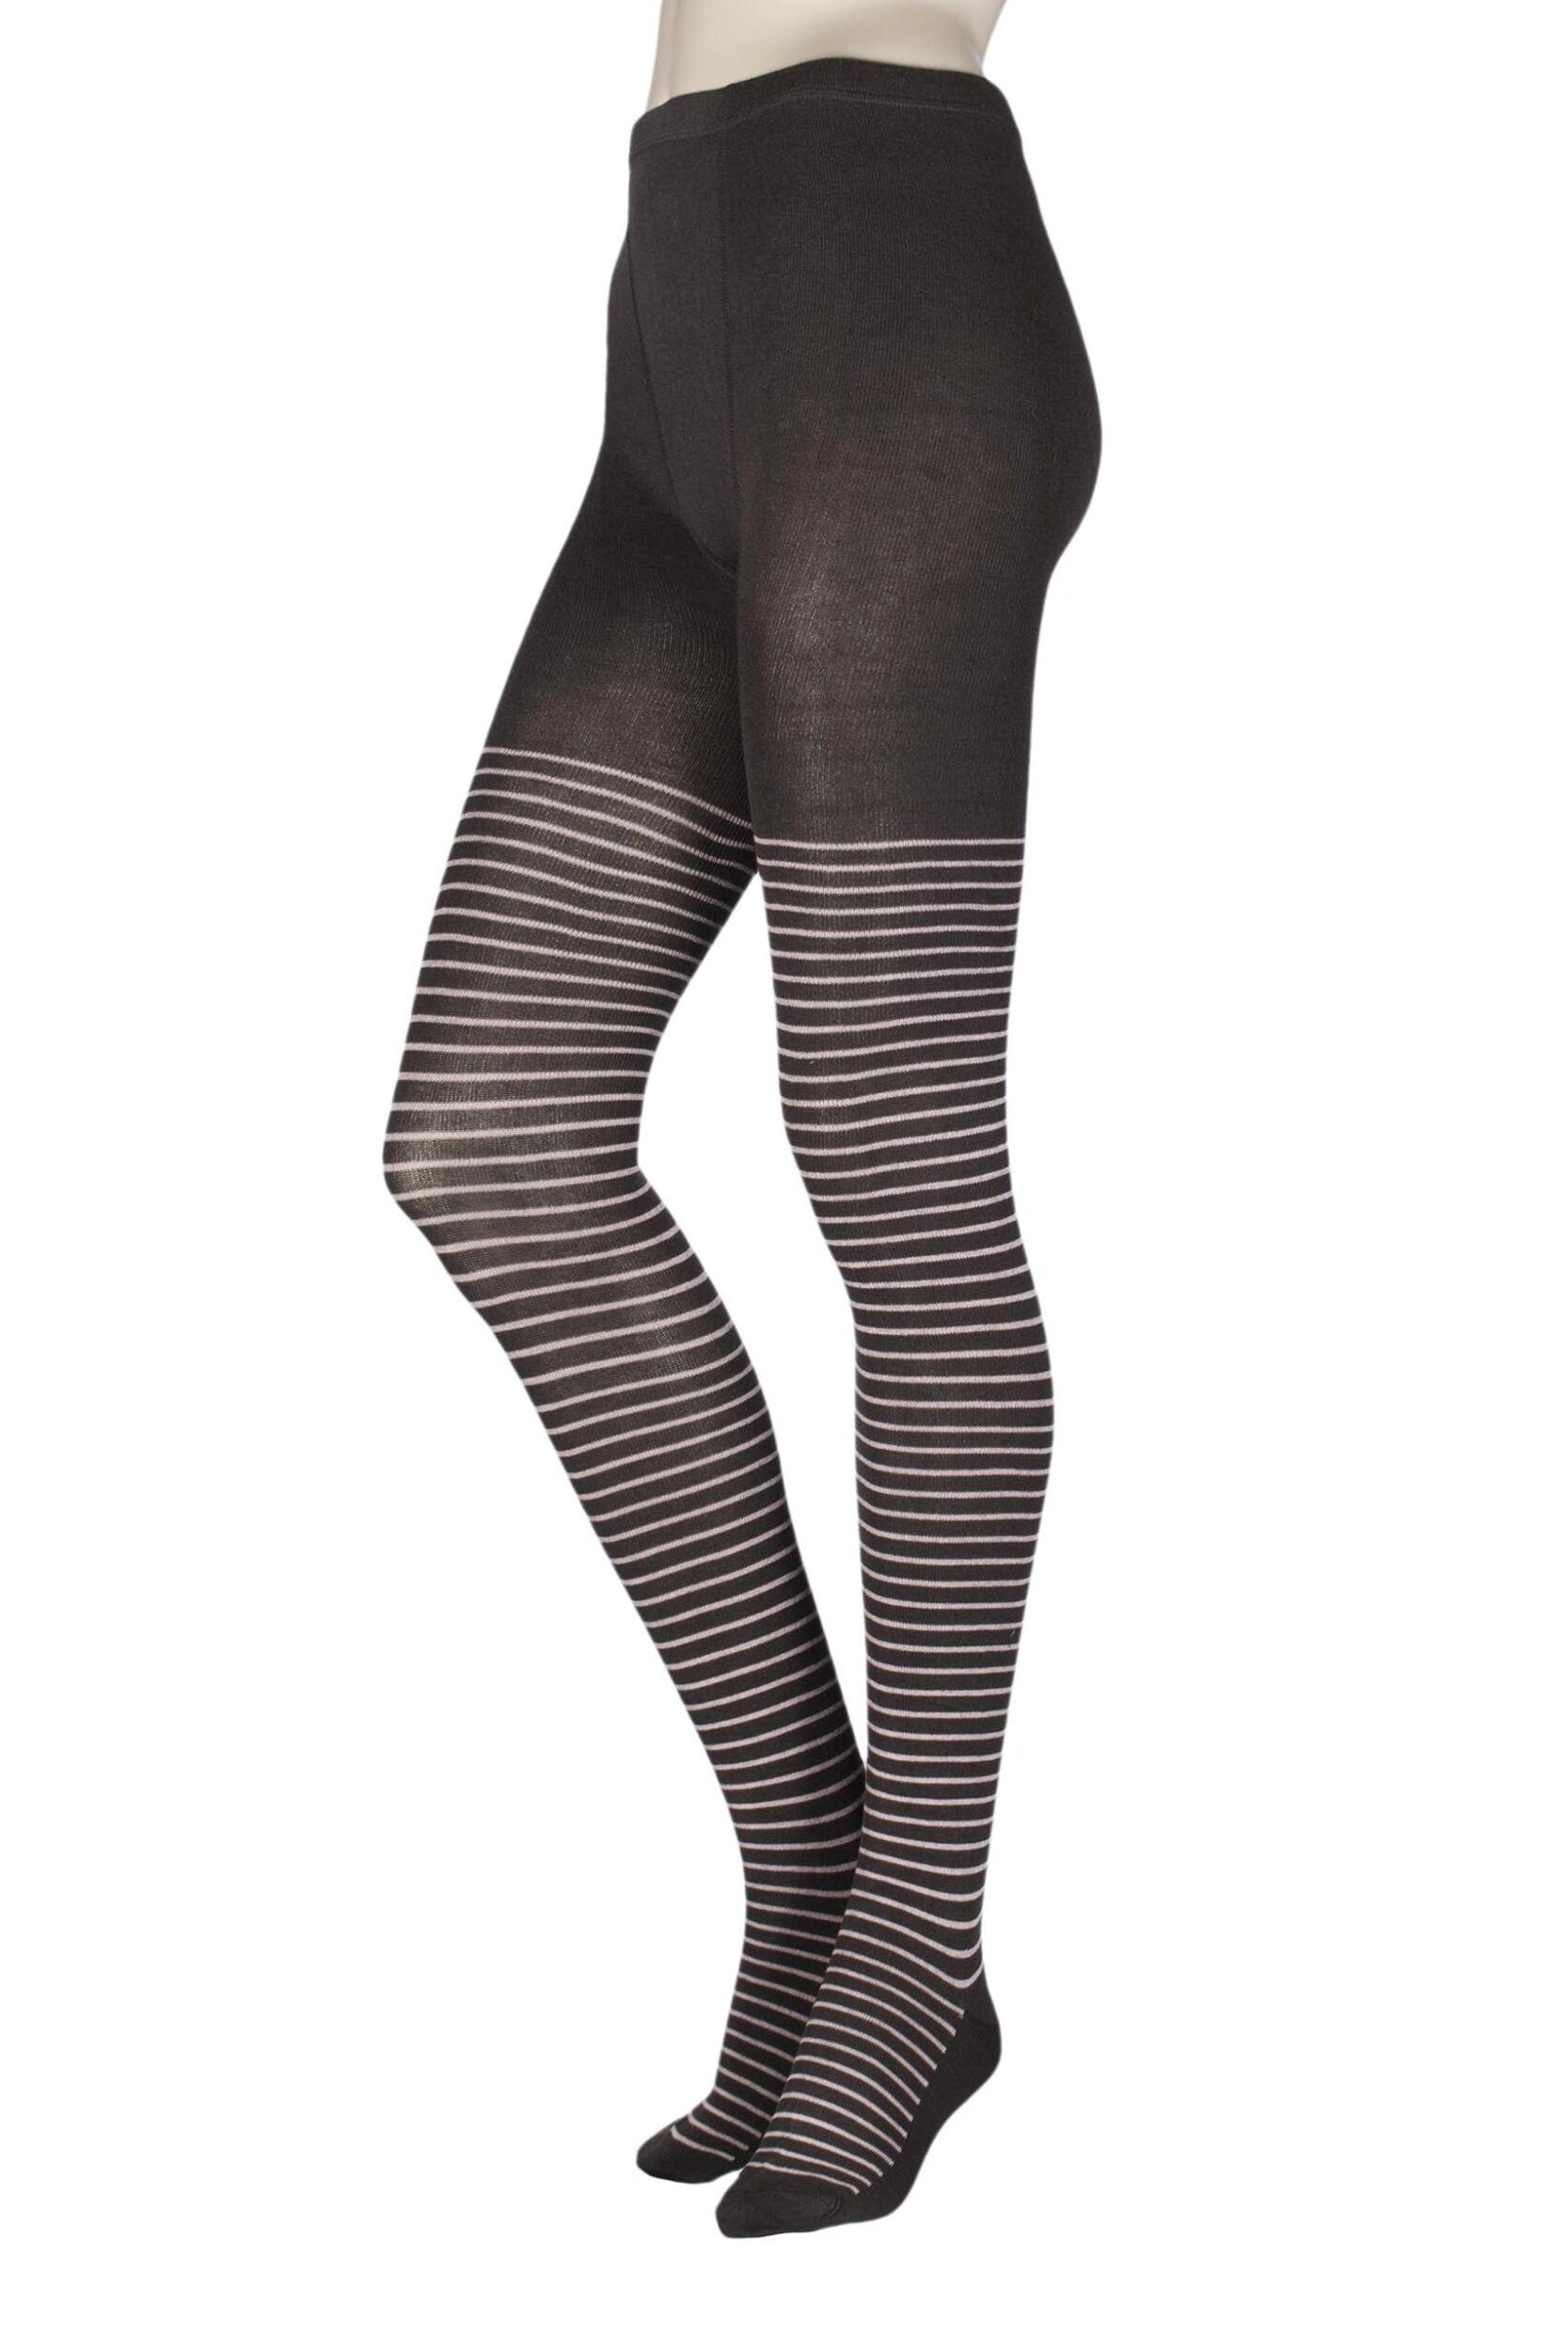 1 Pair Elle Winter Soft Stripe Tights